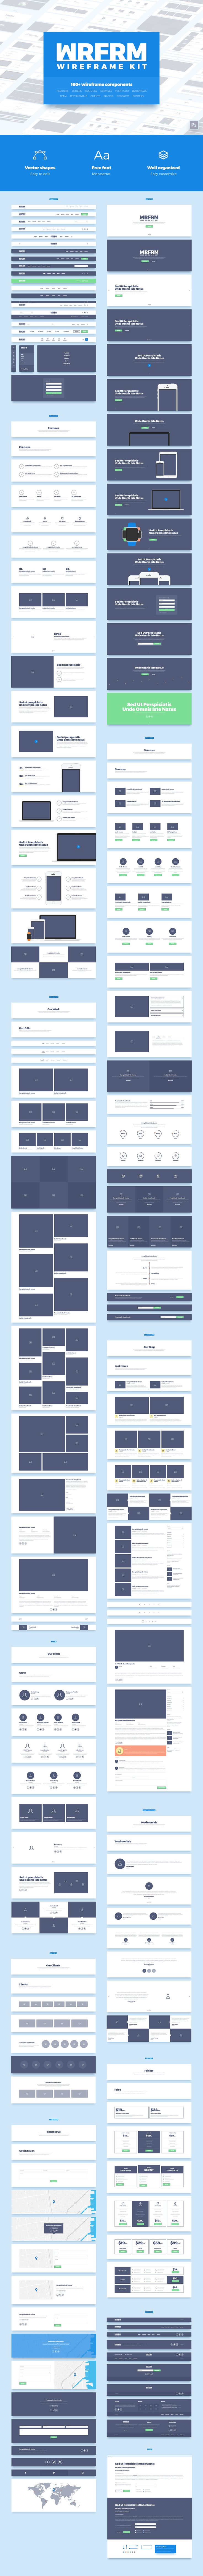 WRFRM – Wireframe Kit for Photoshop.